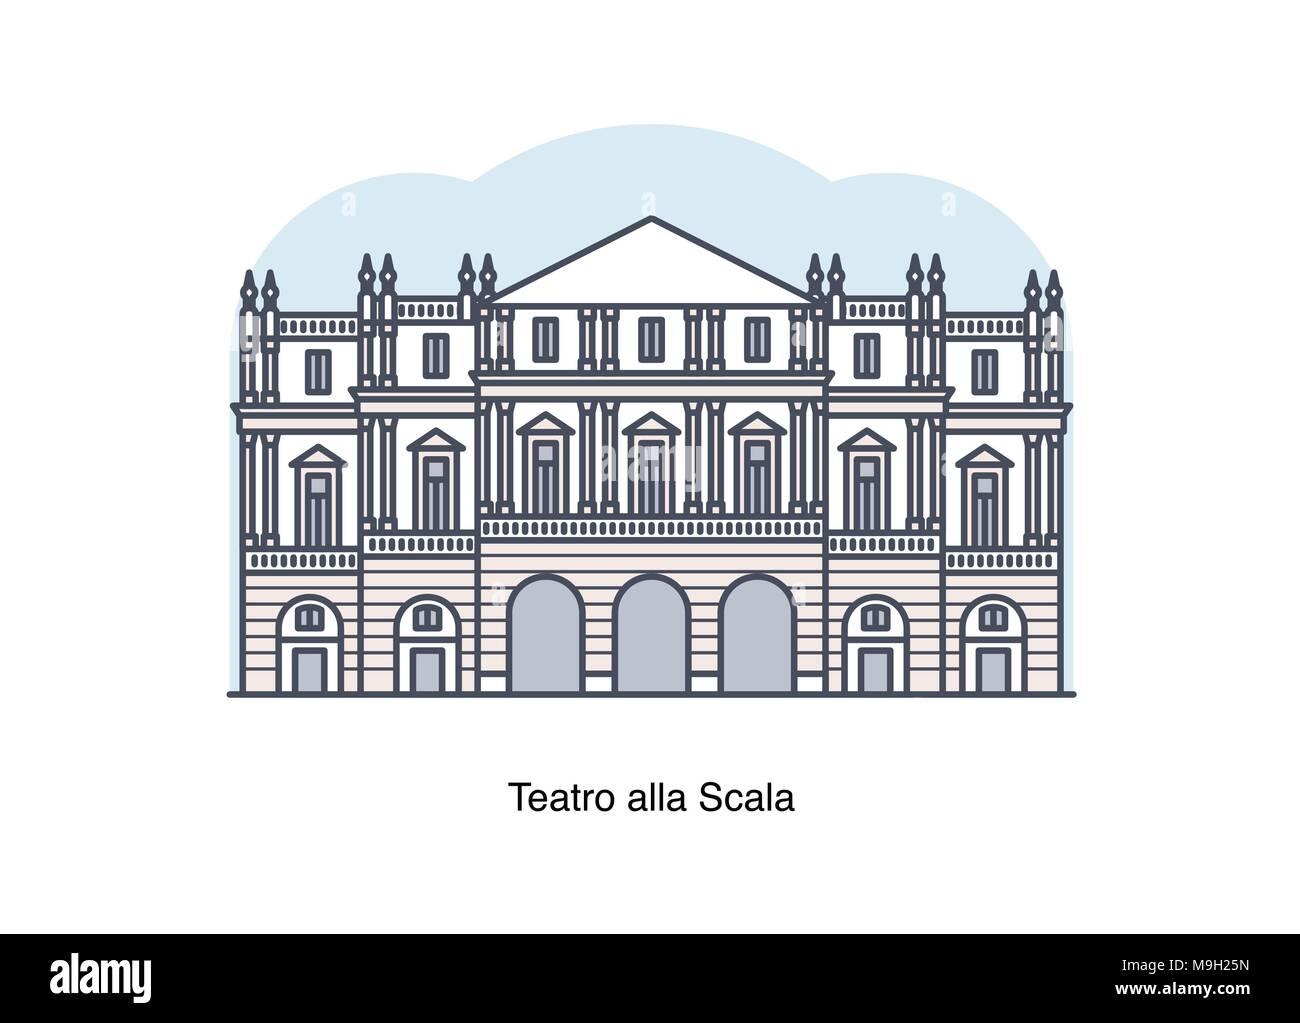 Vector line illustration of Teatro alla Scala (La Scala), Milan, Italy. - Stock Vector